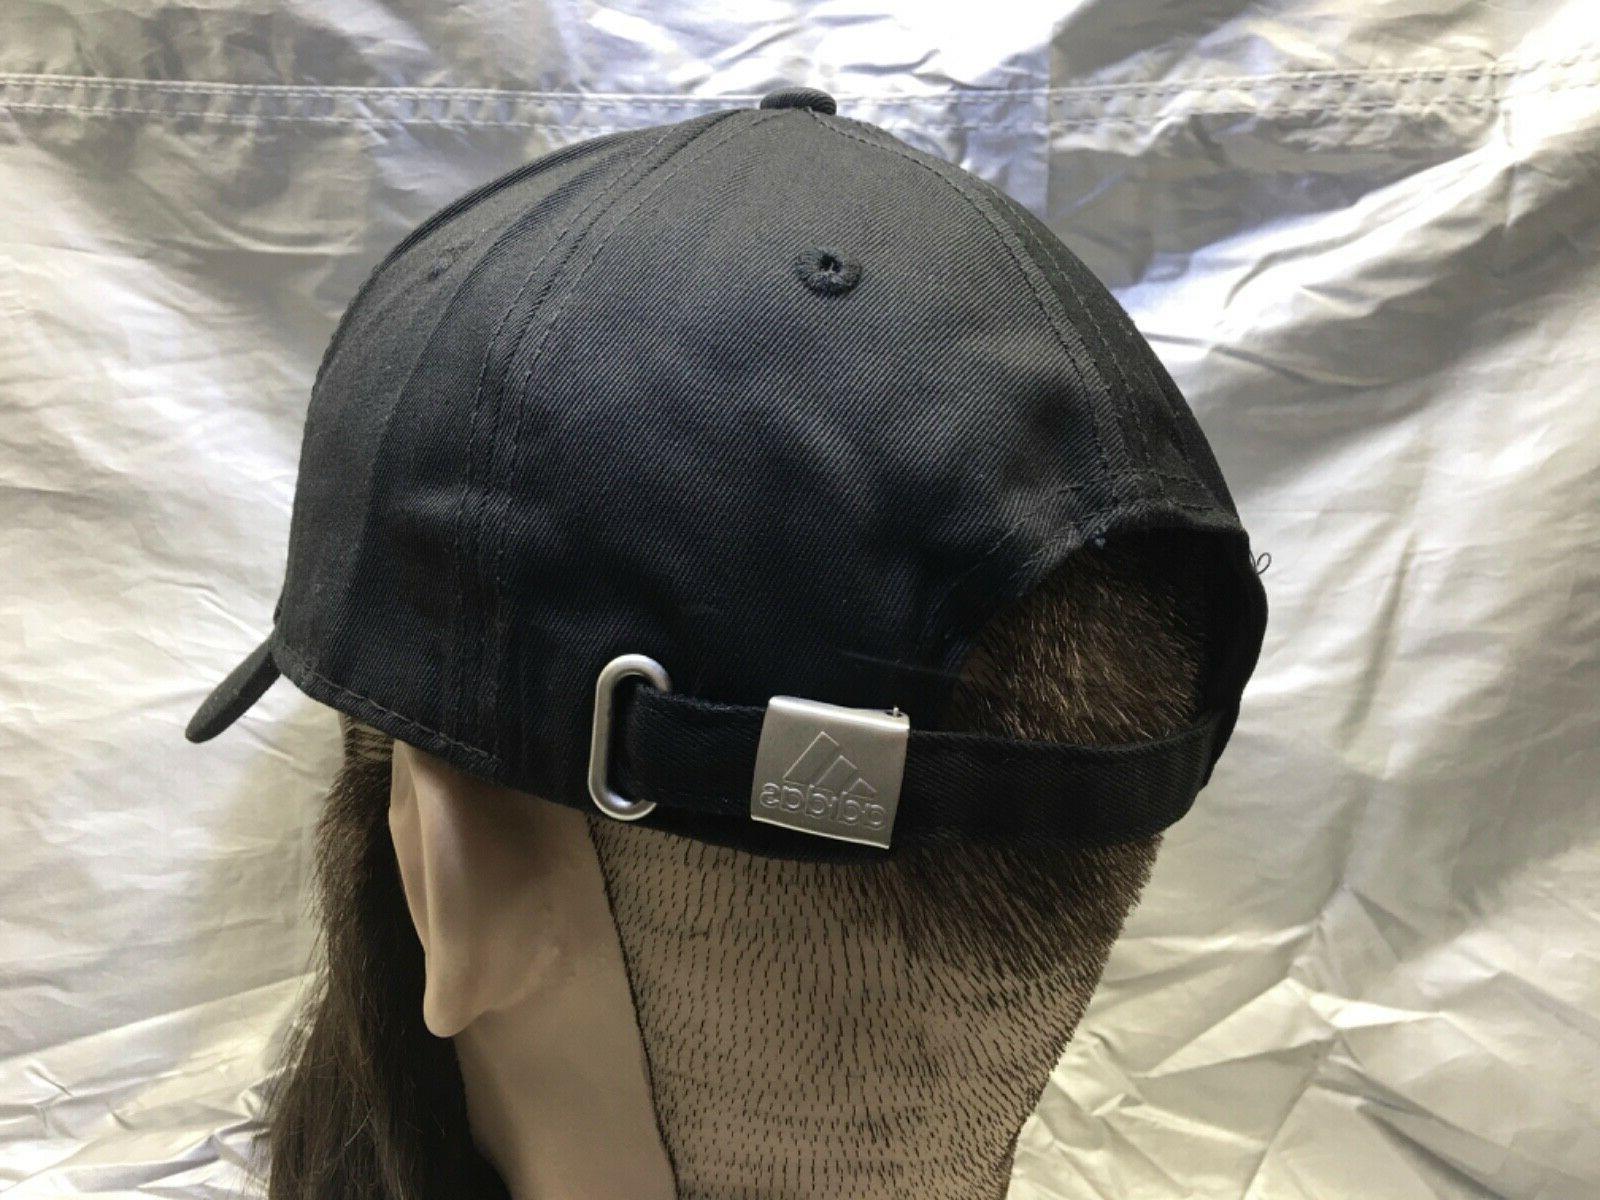 ADIDAS Cap Black Embroidered Emblem Hat